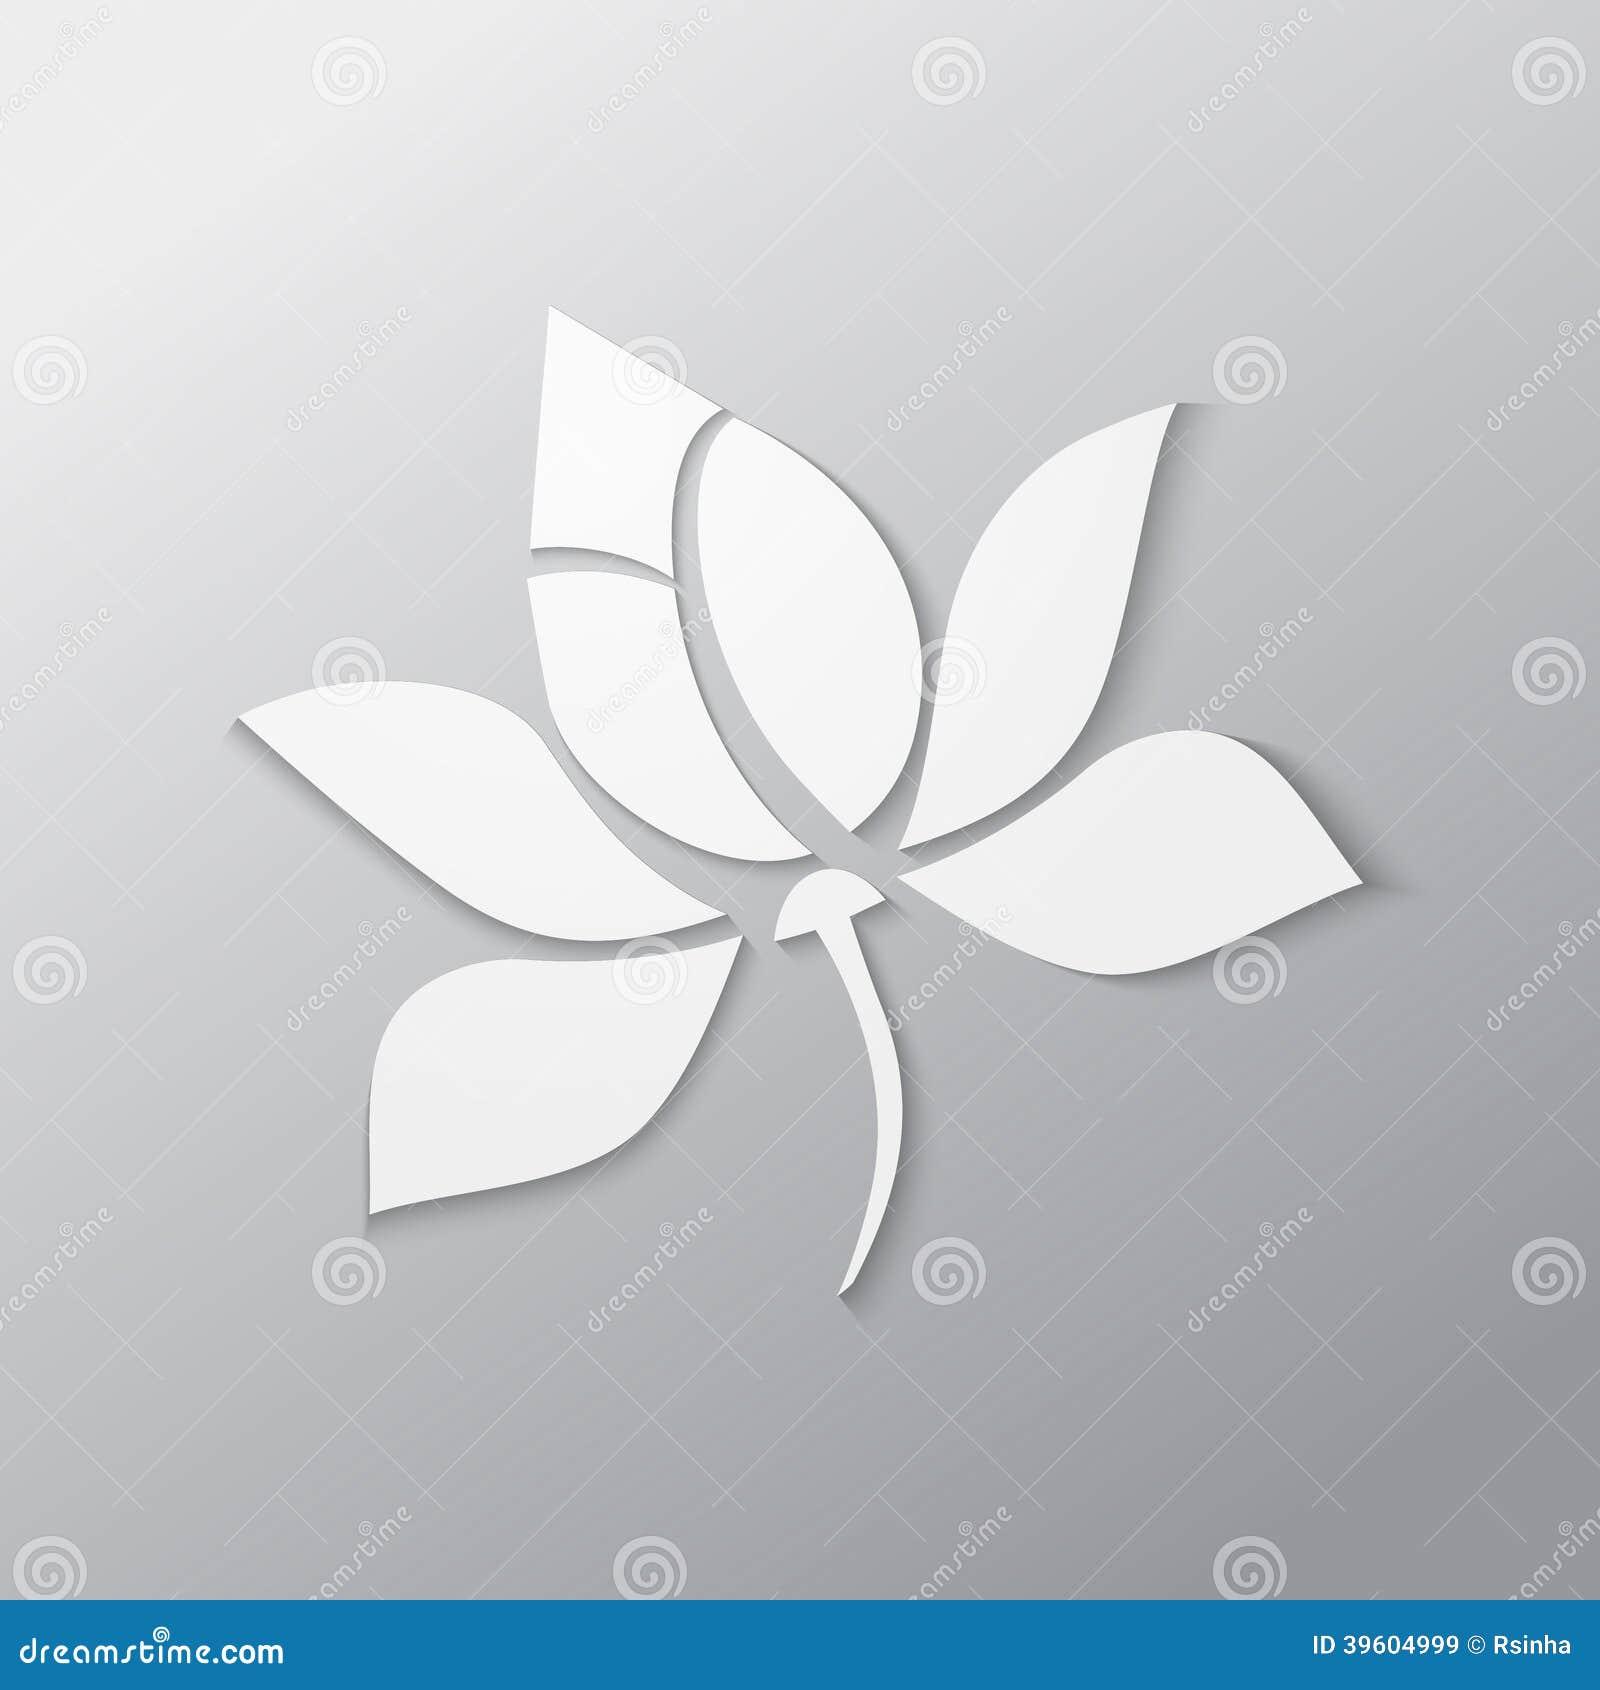 Lotus flower stencil comousar lotus flower stencil lotus flower stencil lotus izmirmasajfo